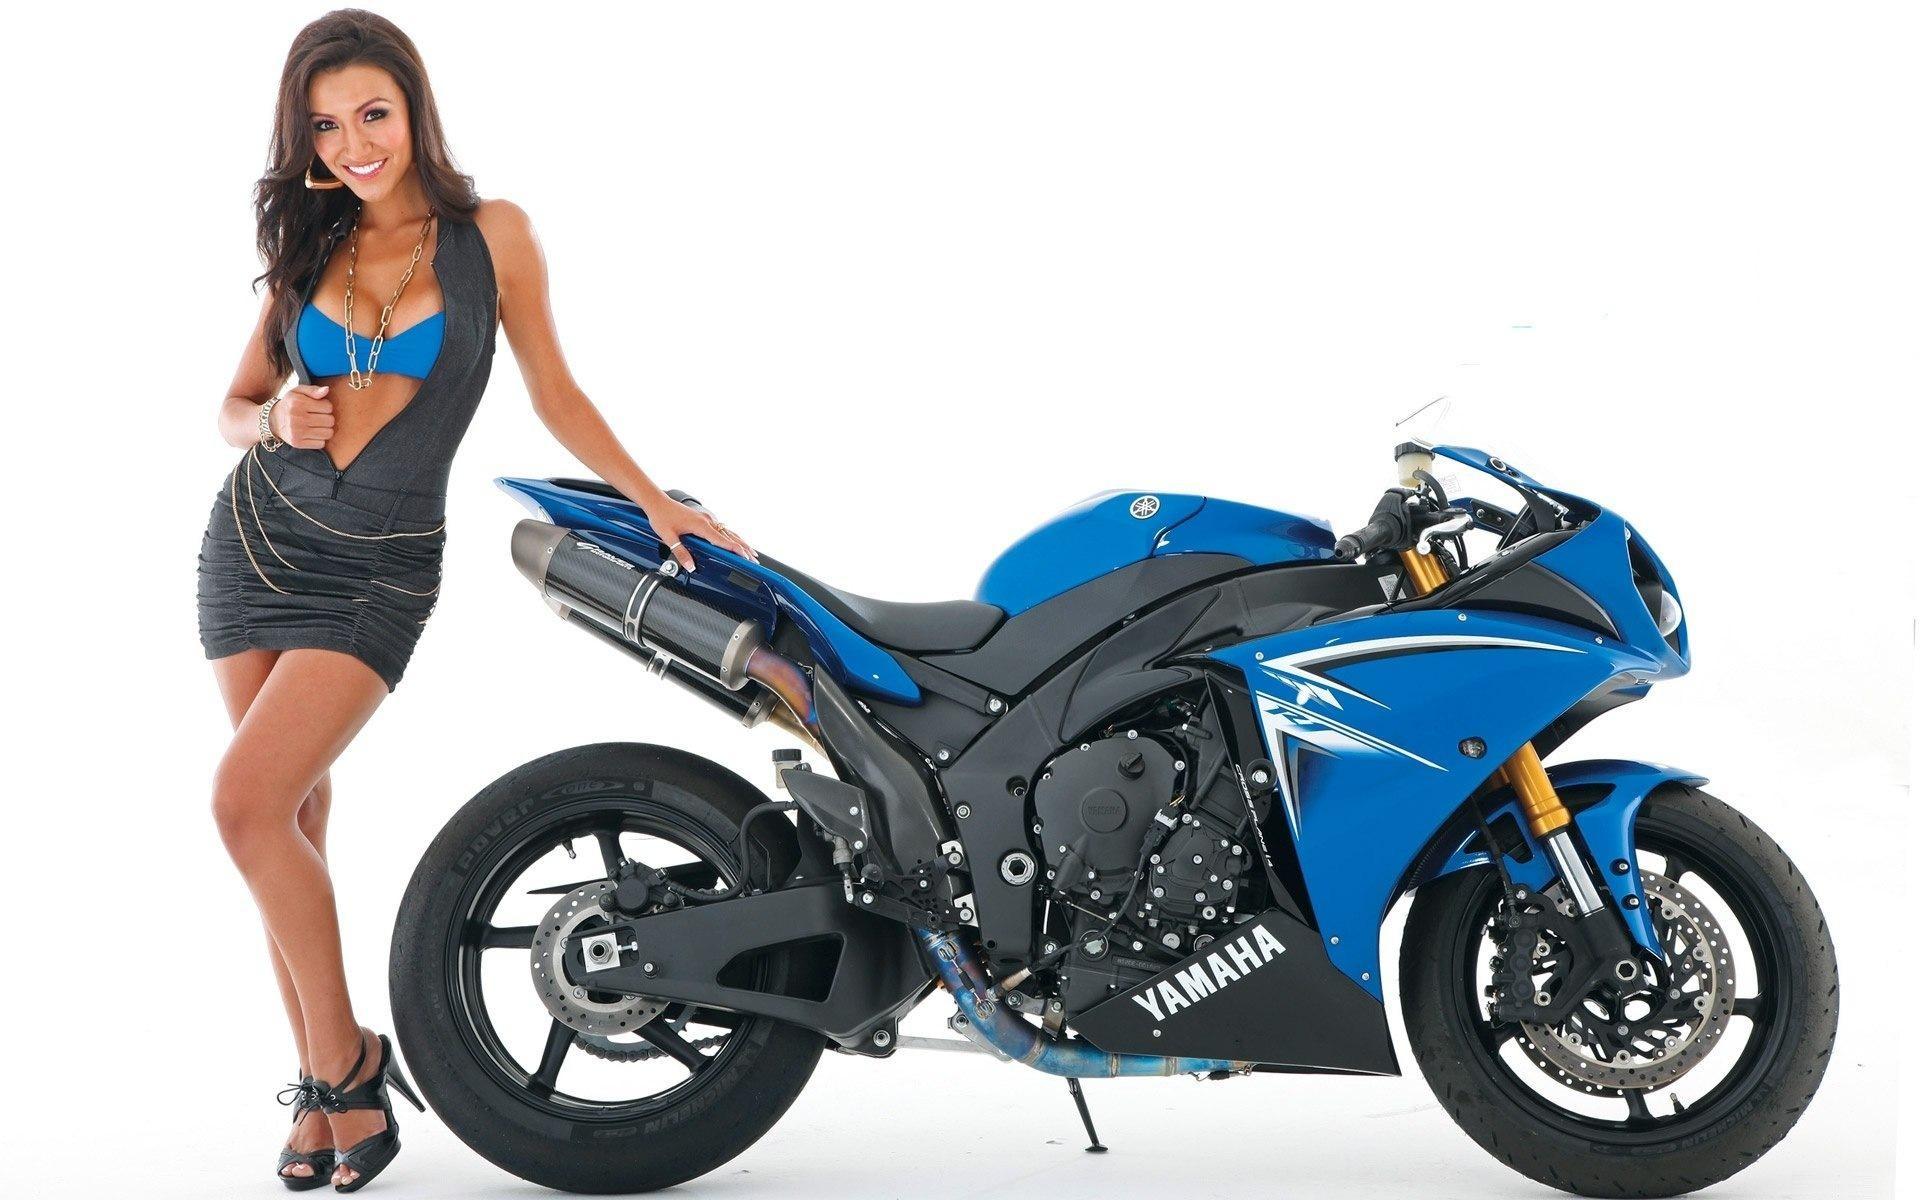 Girls & Motorcycles #17